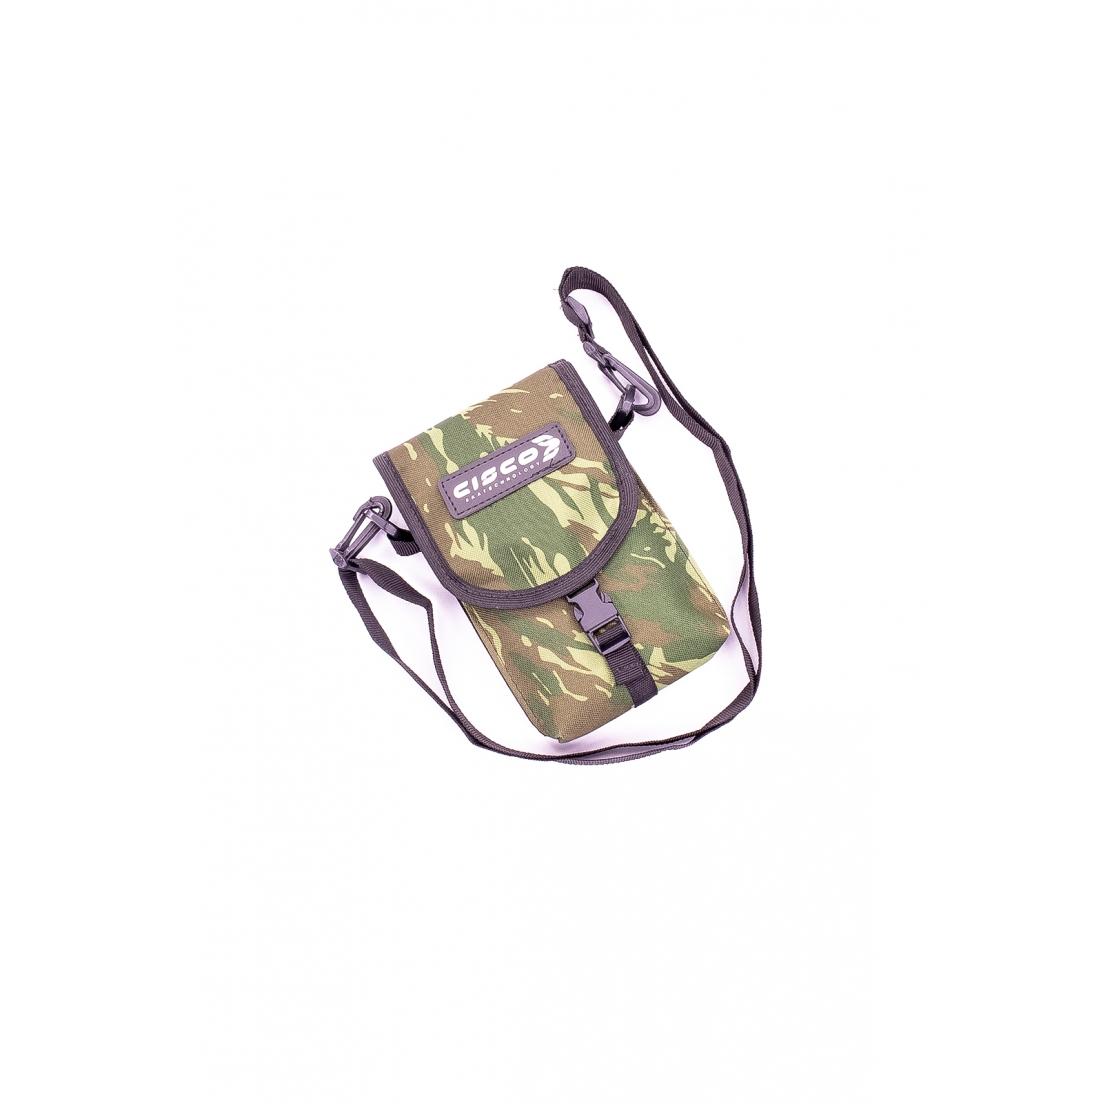 Shoulder Bag Cisco Skate Camuflada Green